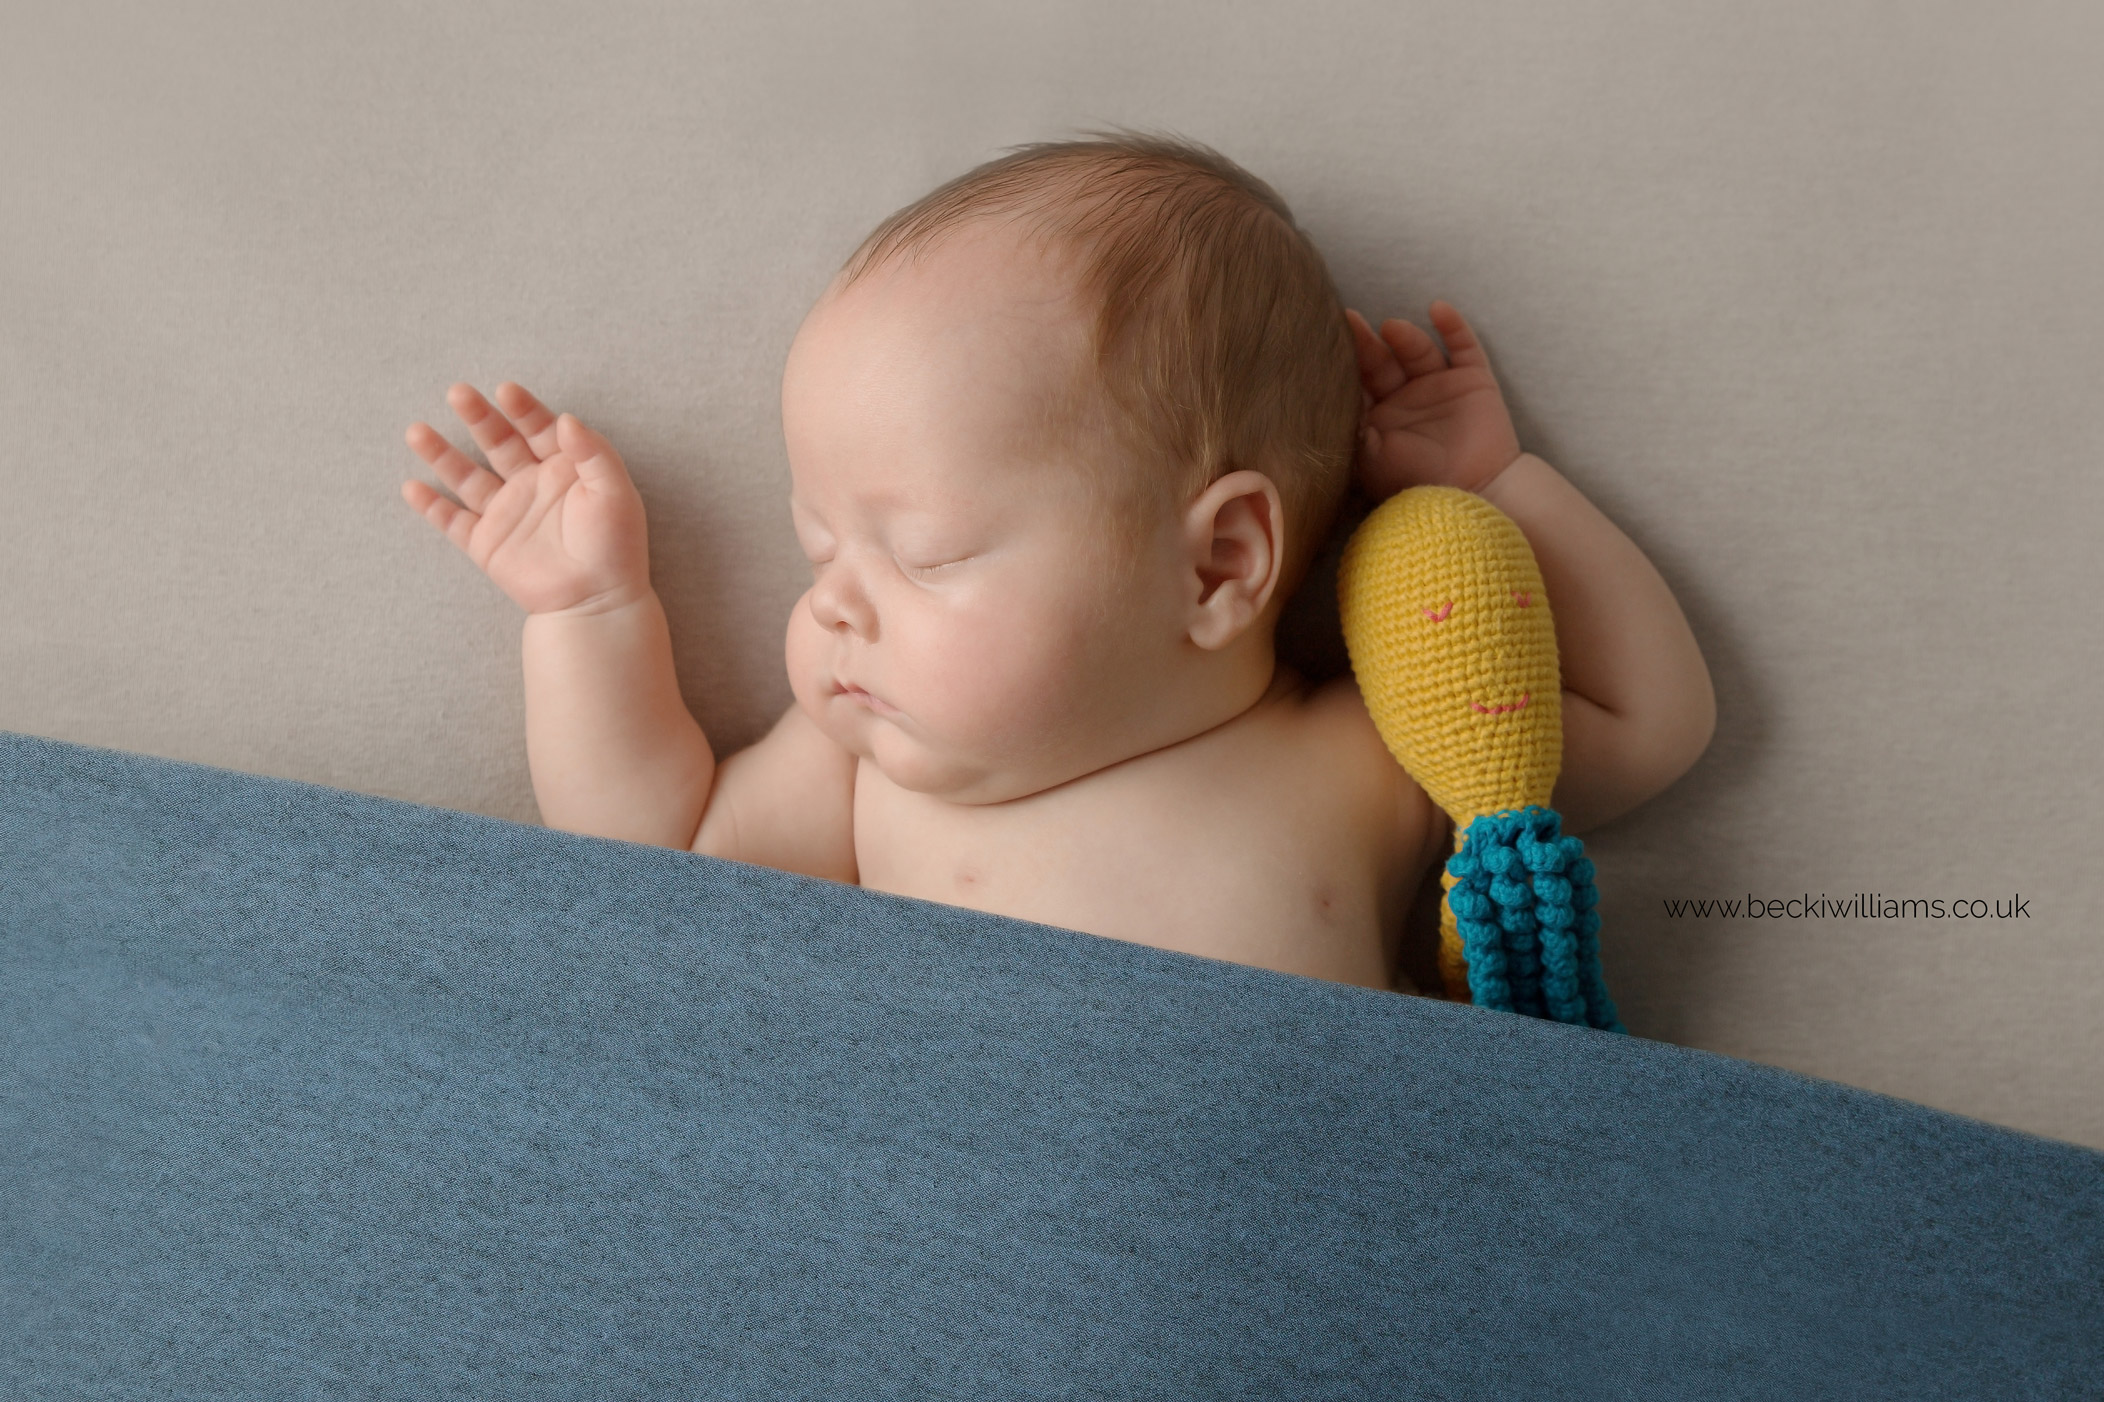 newborn boy hugging his octopus for a preemie toy for newborn baby photo shoot in hemel hempstead